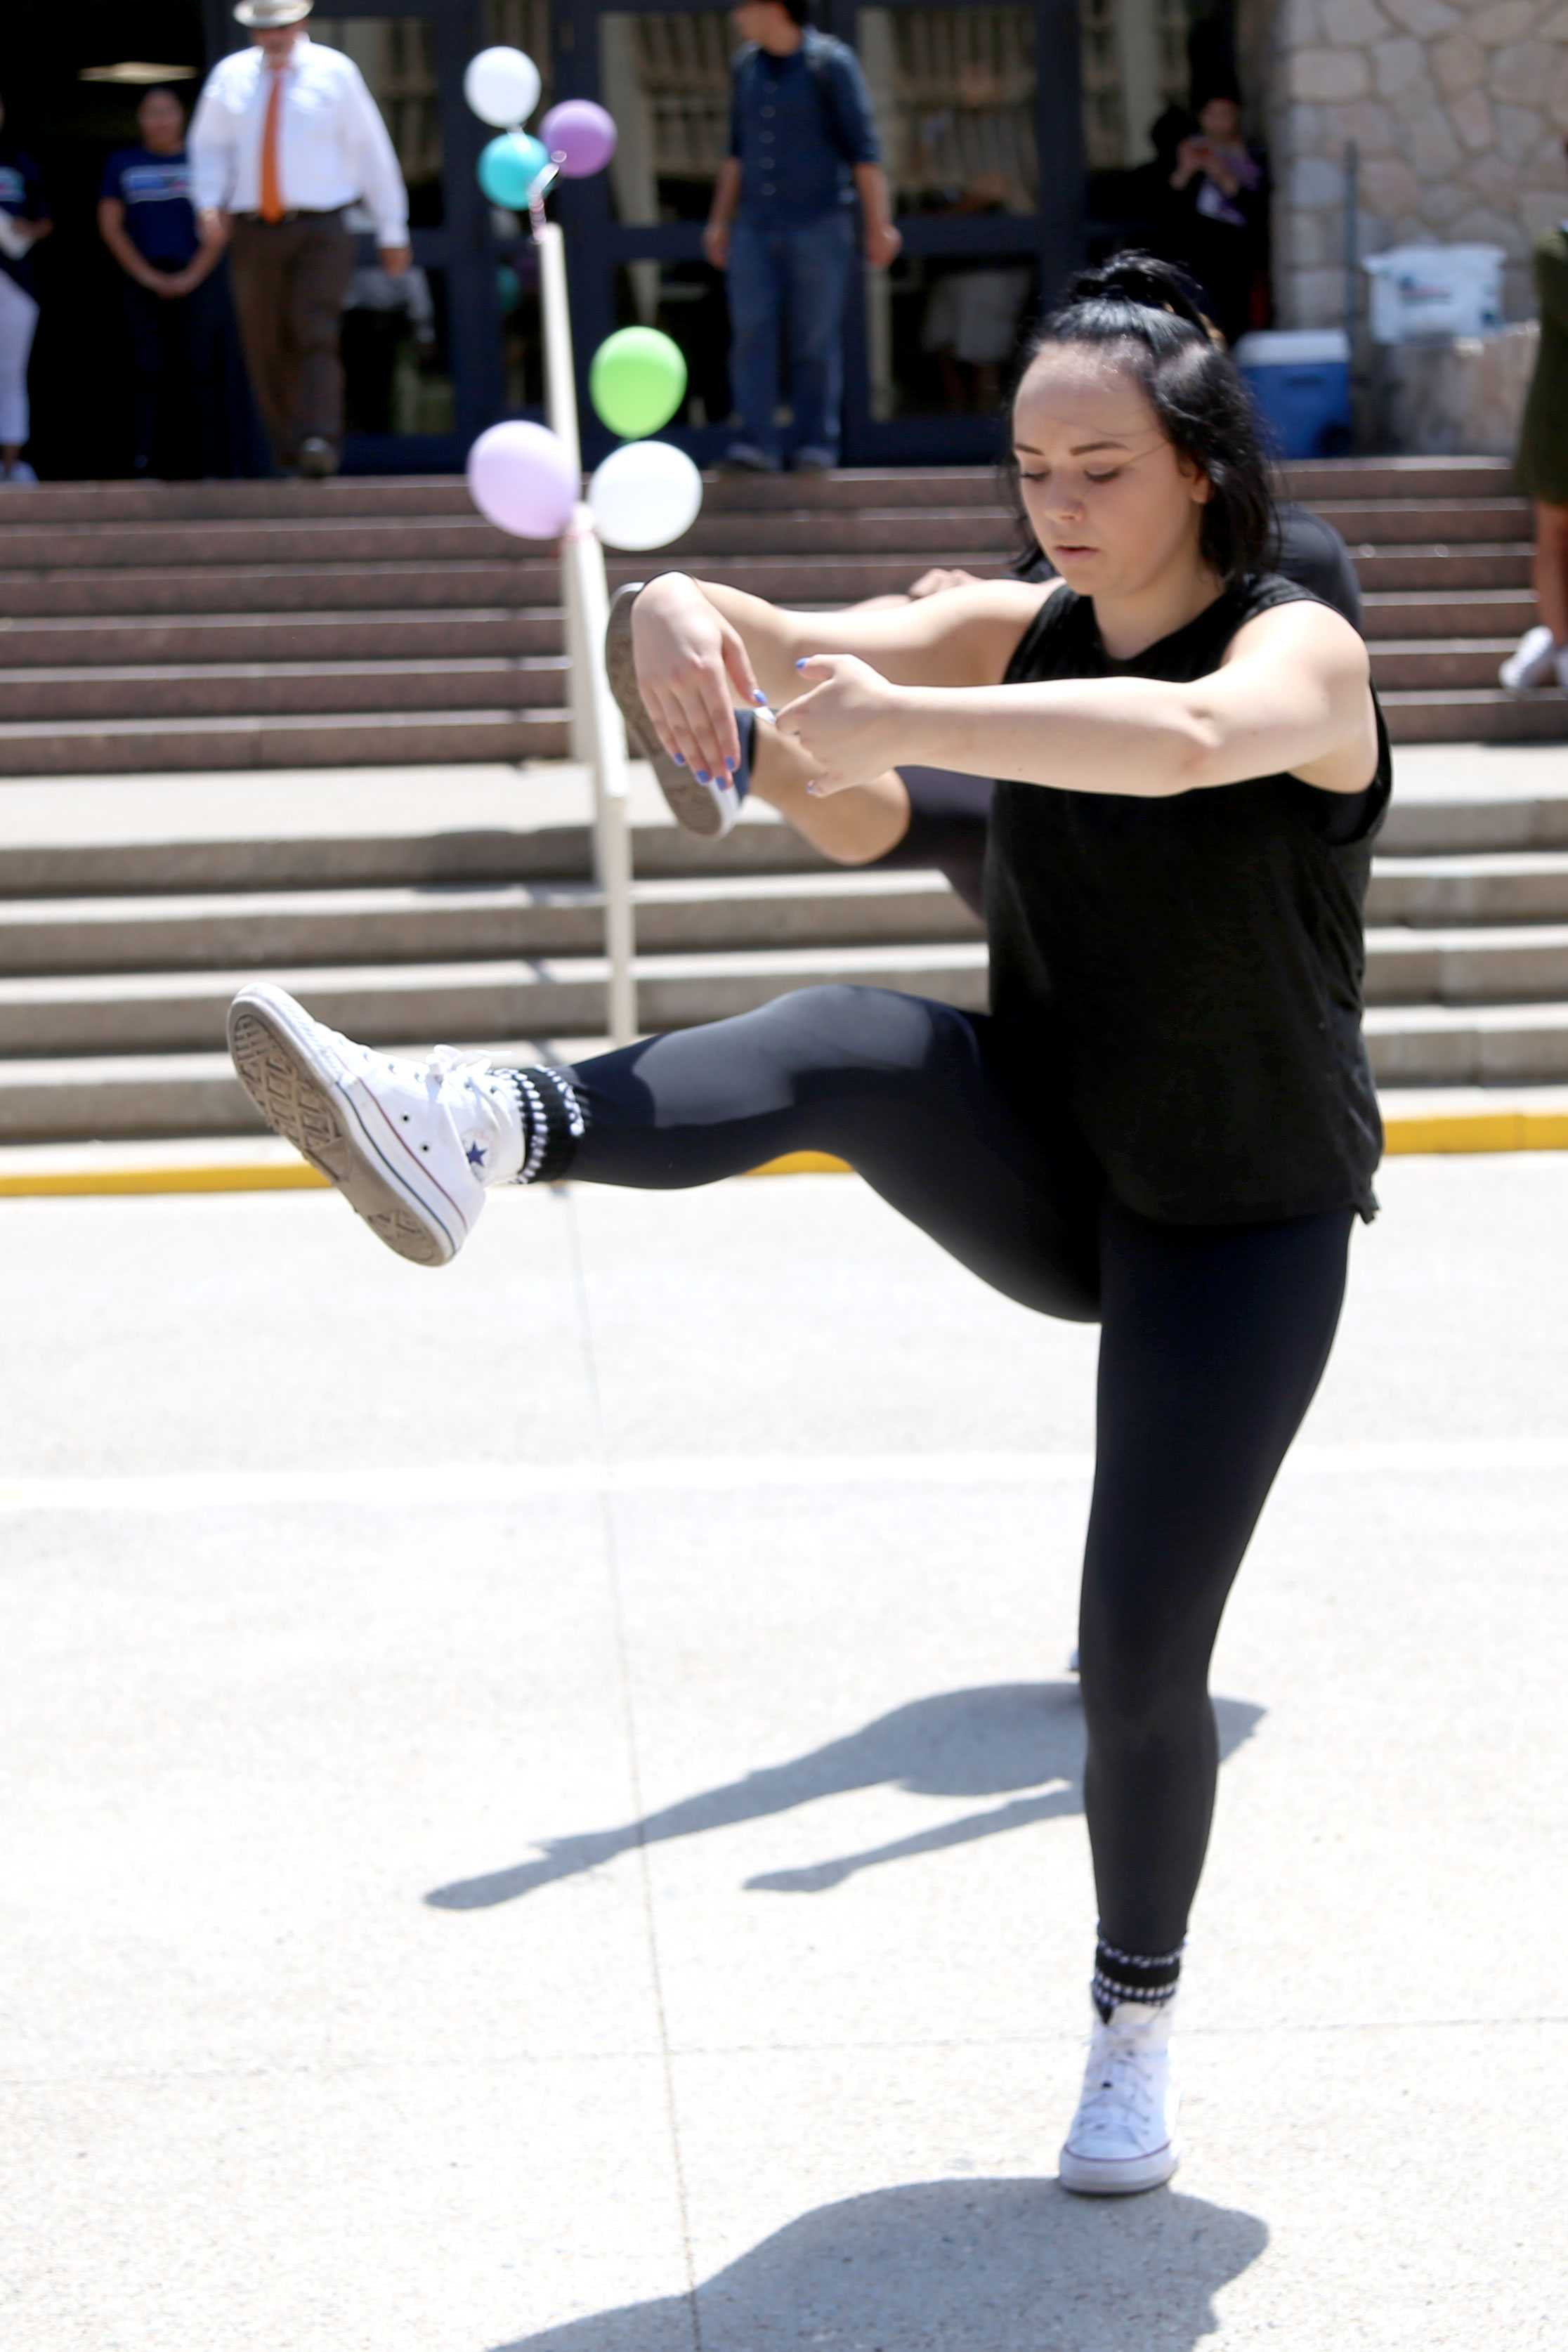 Sophomore+dance+major+Krysta+Quiambao+performs+with+her+classmates.+